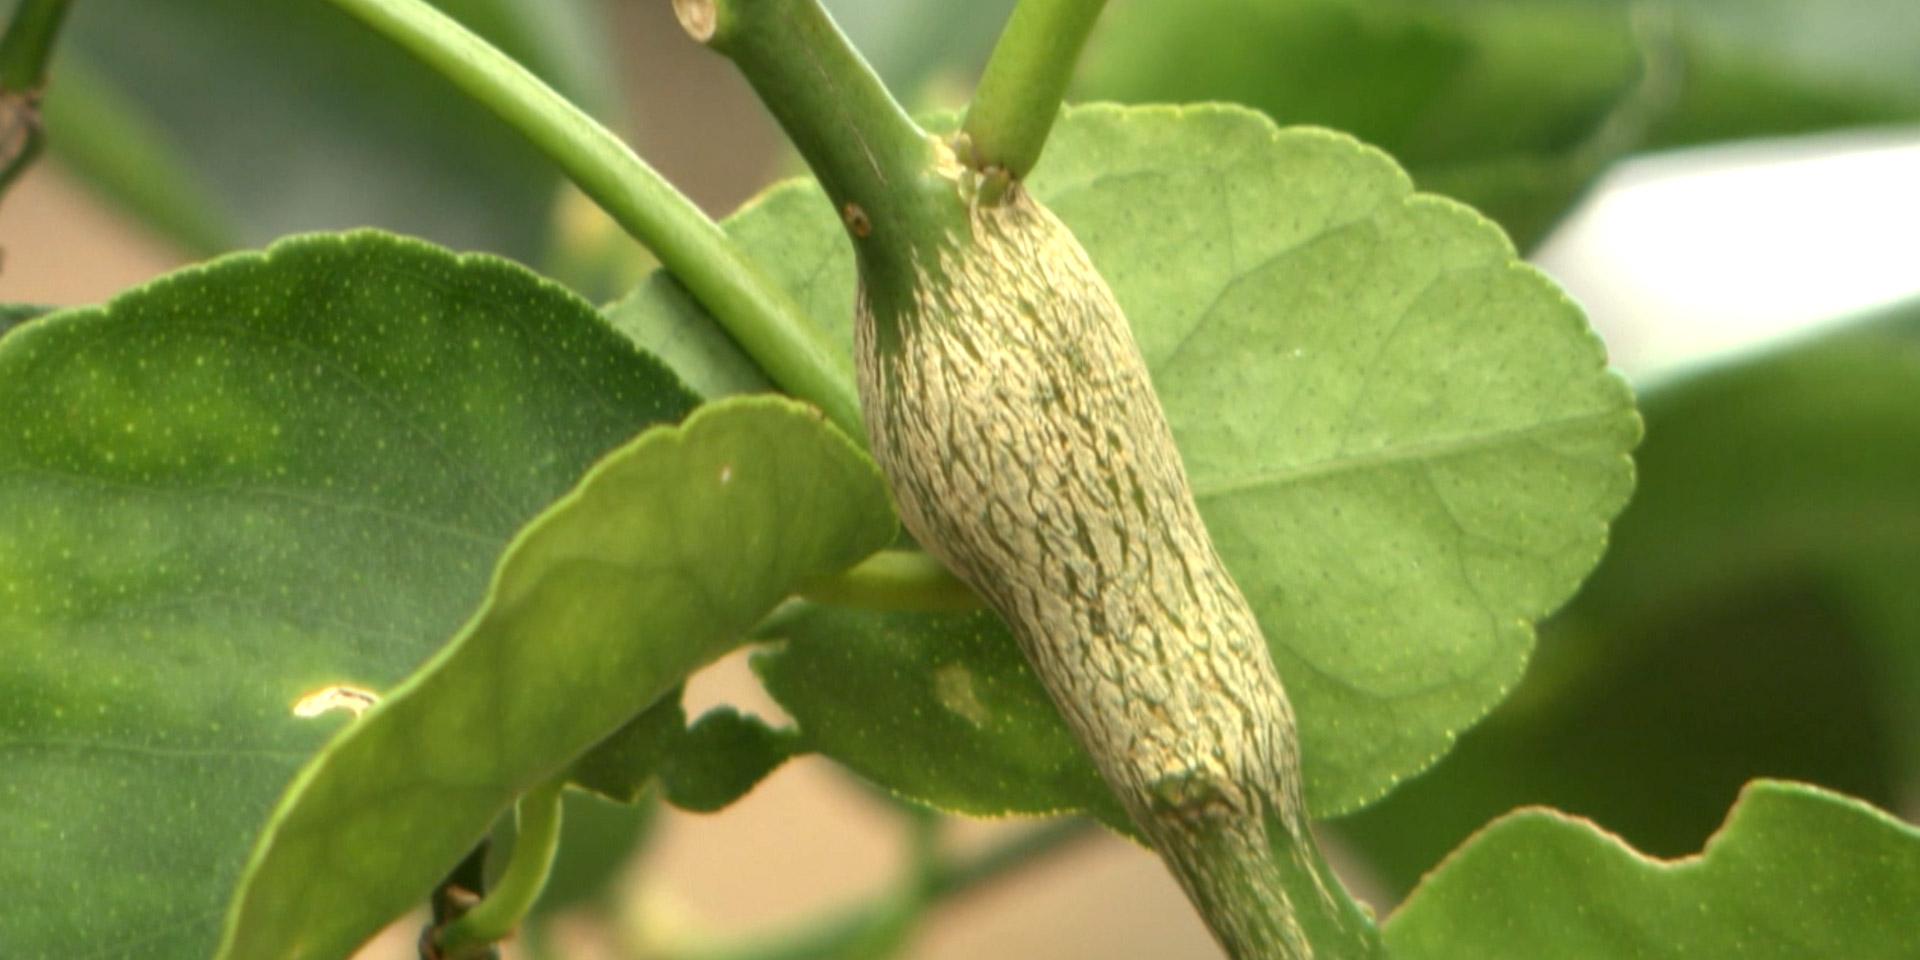 citrus-gall-wasp.jpg